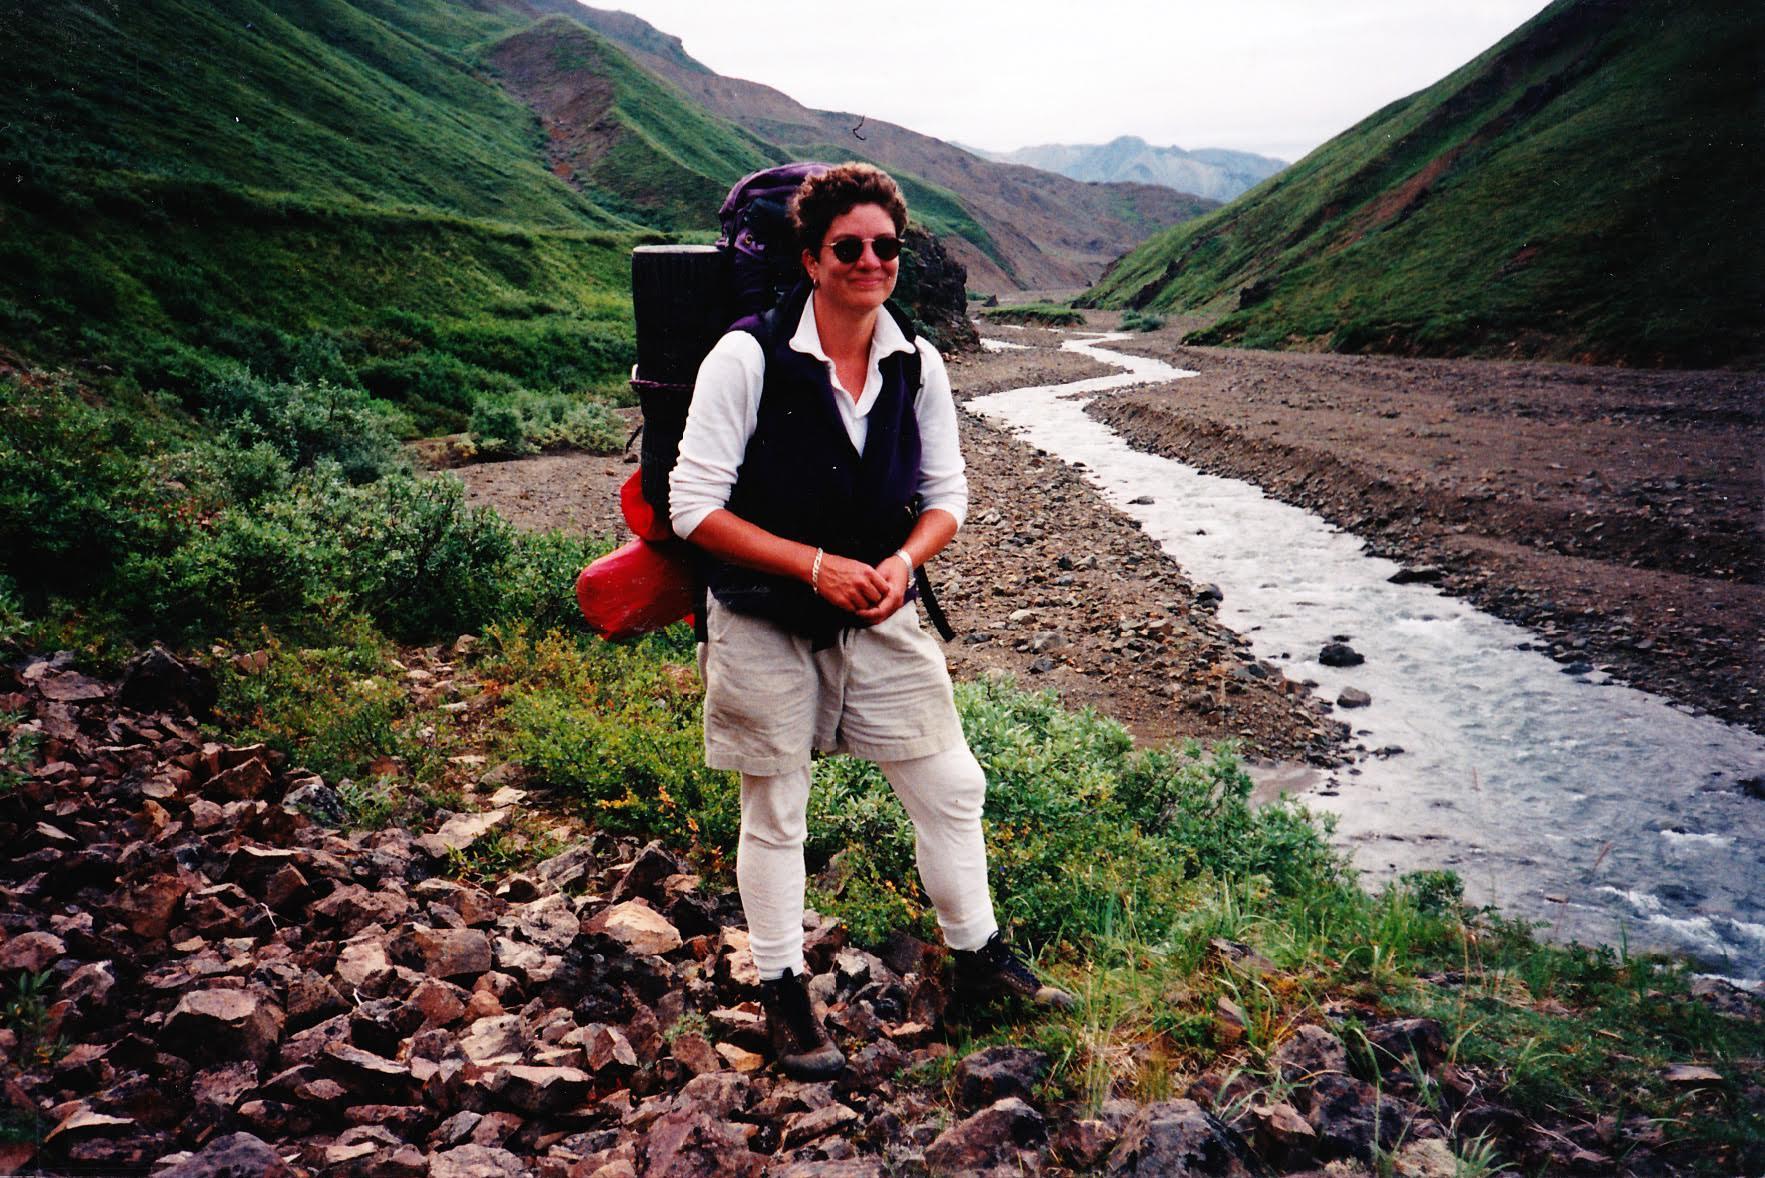 Kim Wyatt backpacks through the wilderness of Denali National Park & Preserve. Photo/Provided